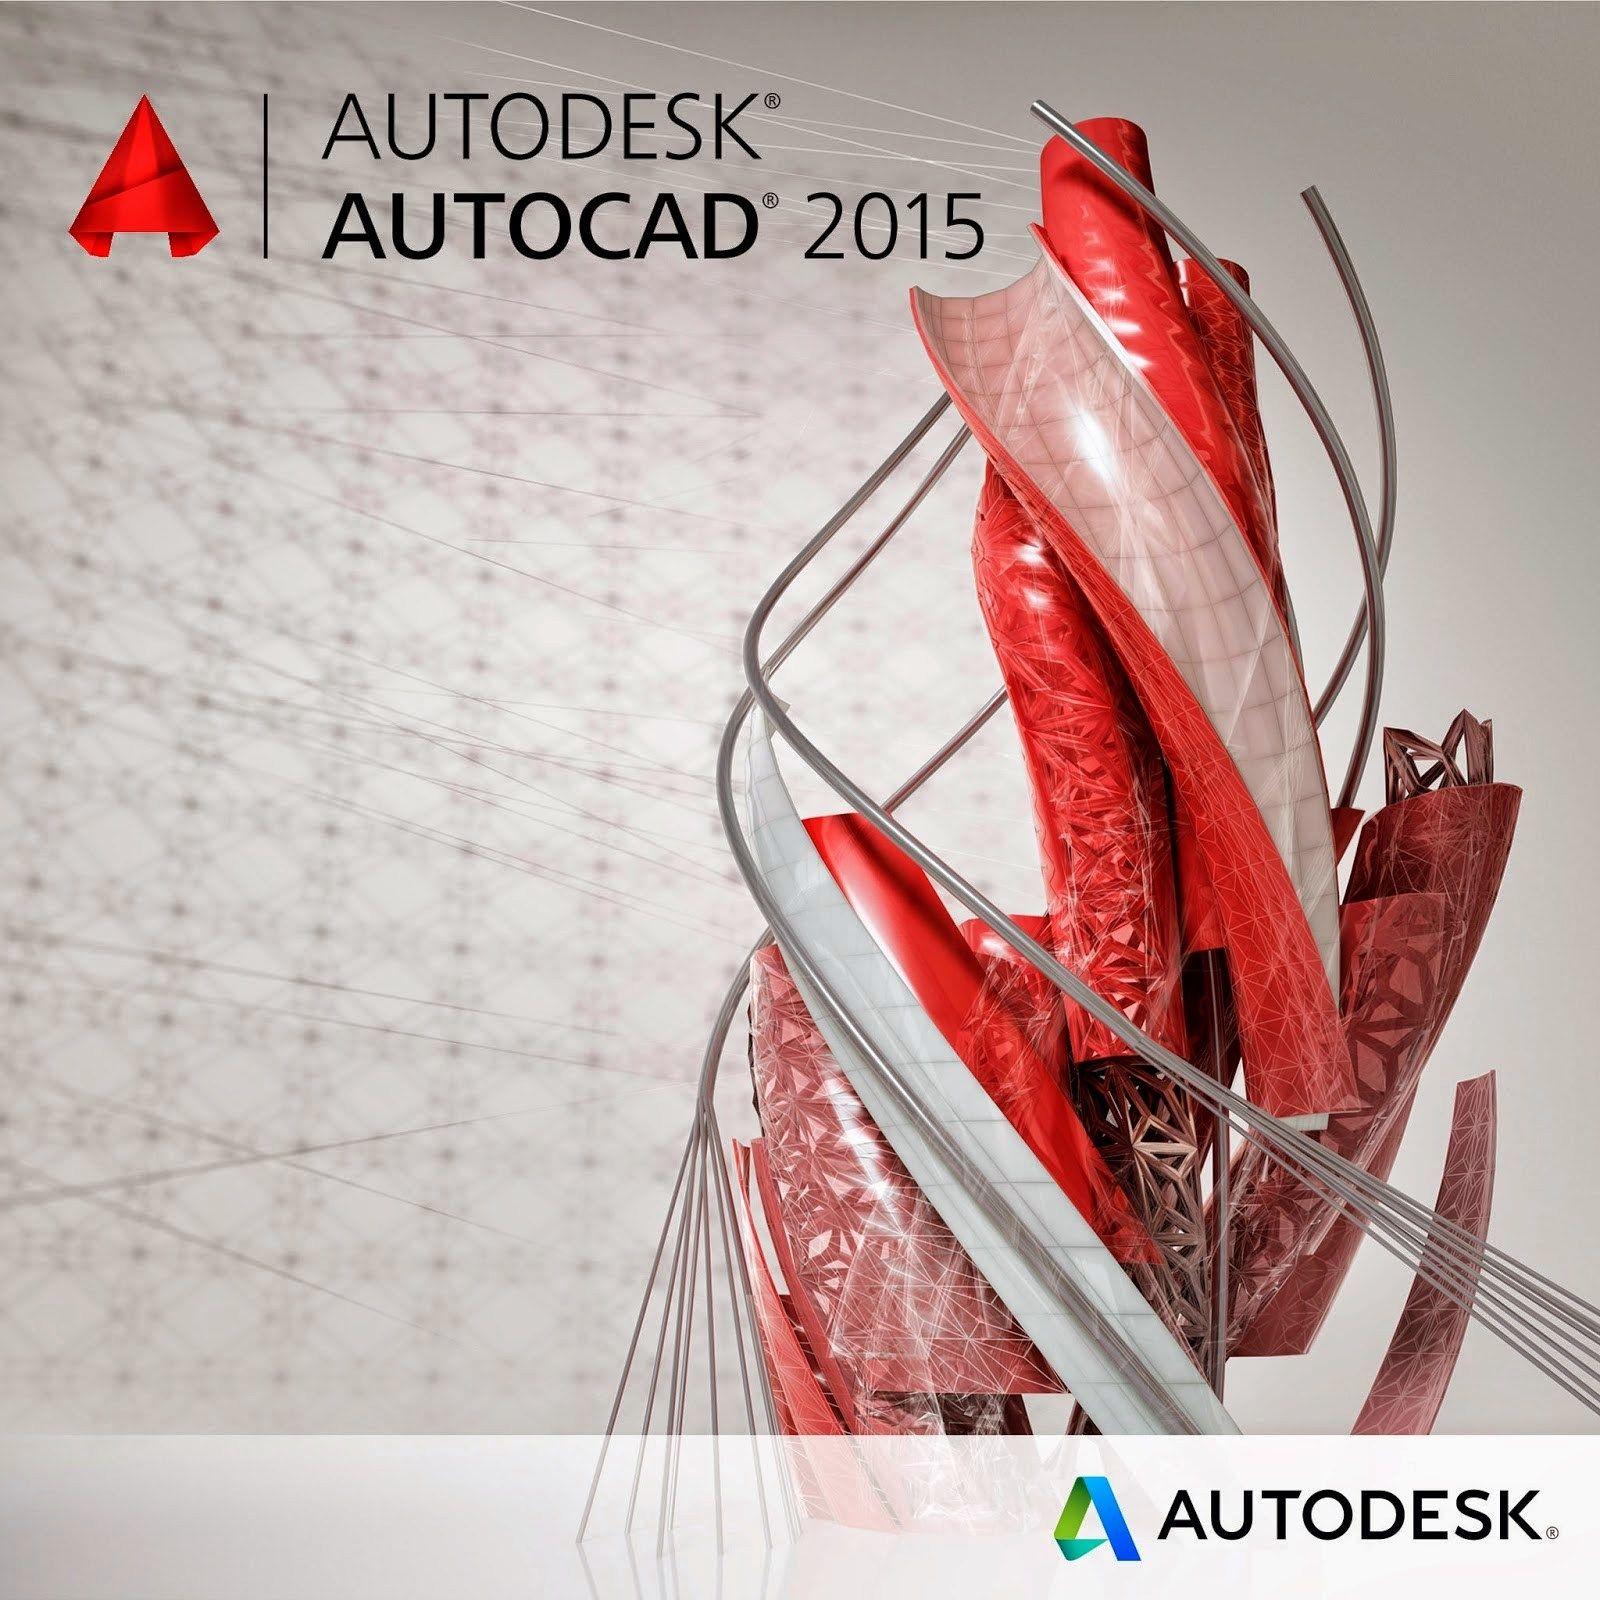 autocad mep 2013 crack free download